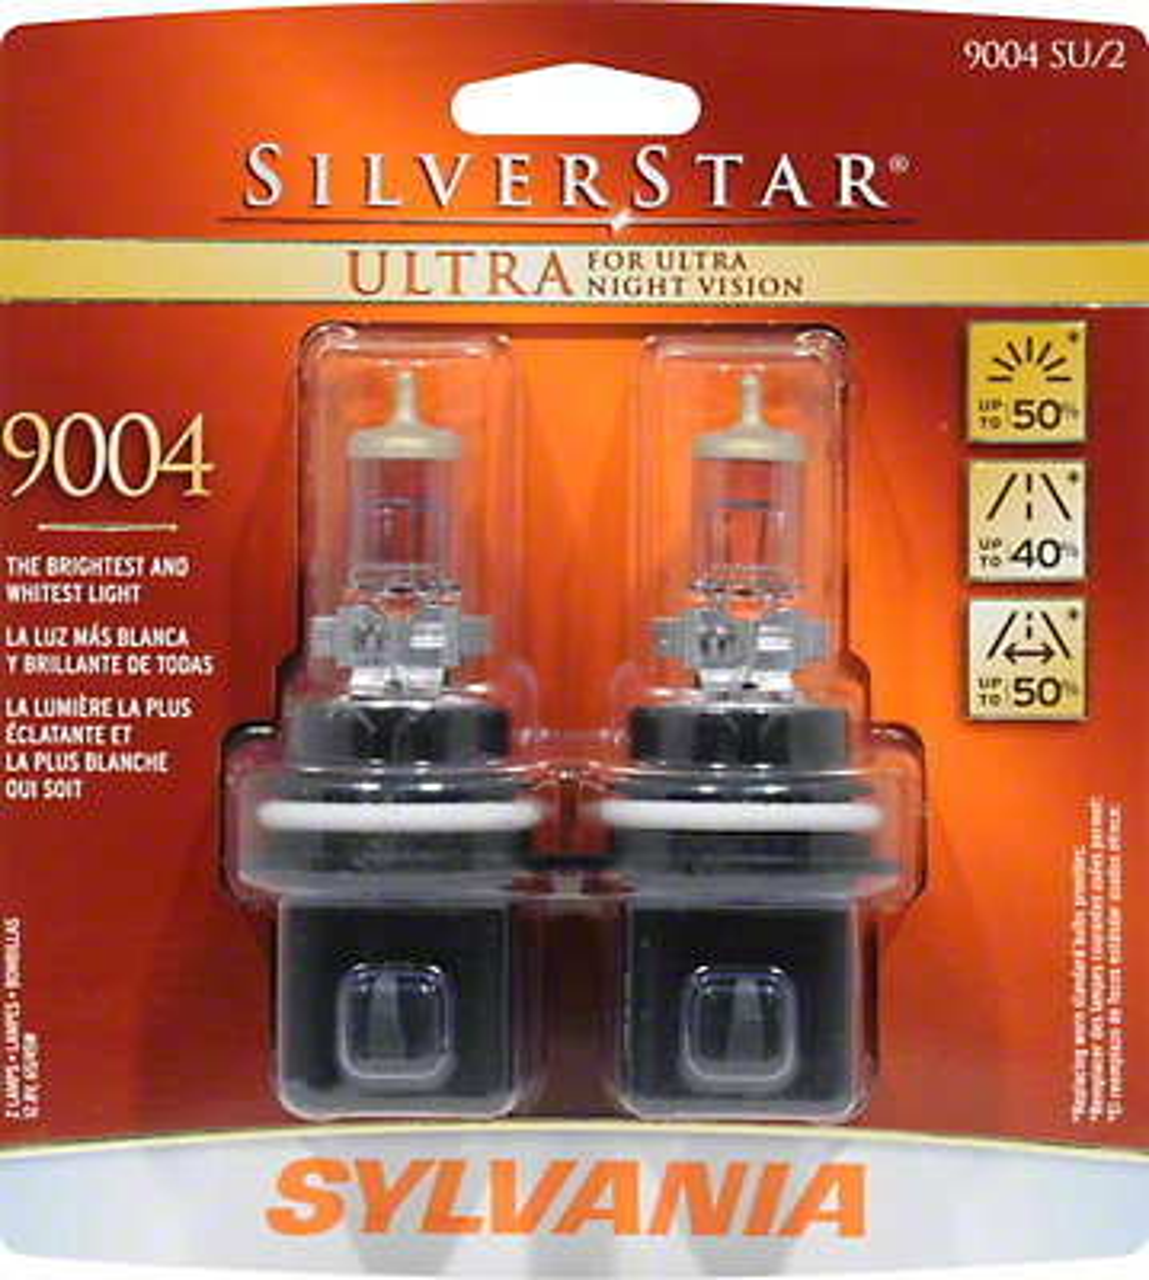 Sylvania Silverstar Ultra Light Bulbs - 9004